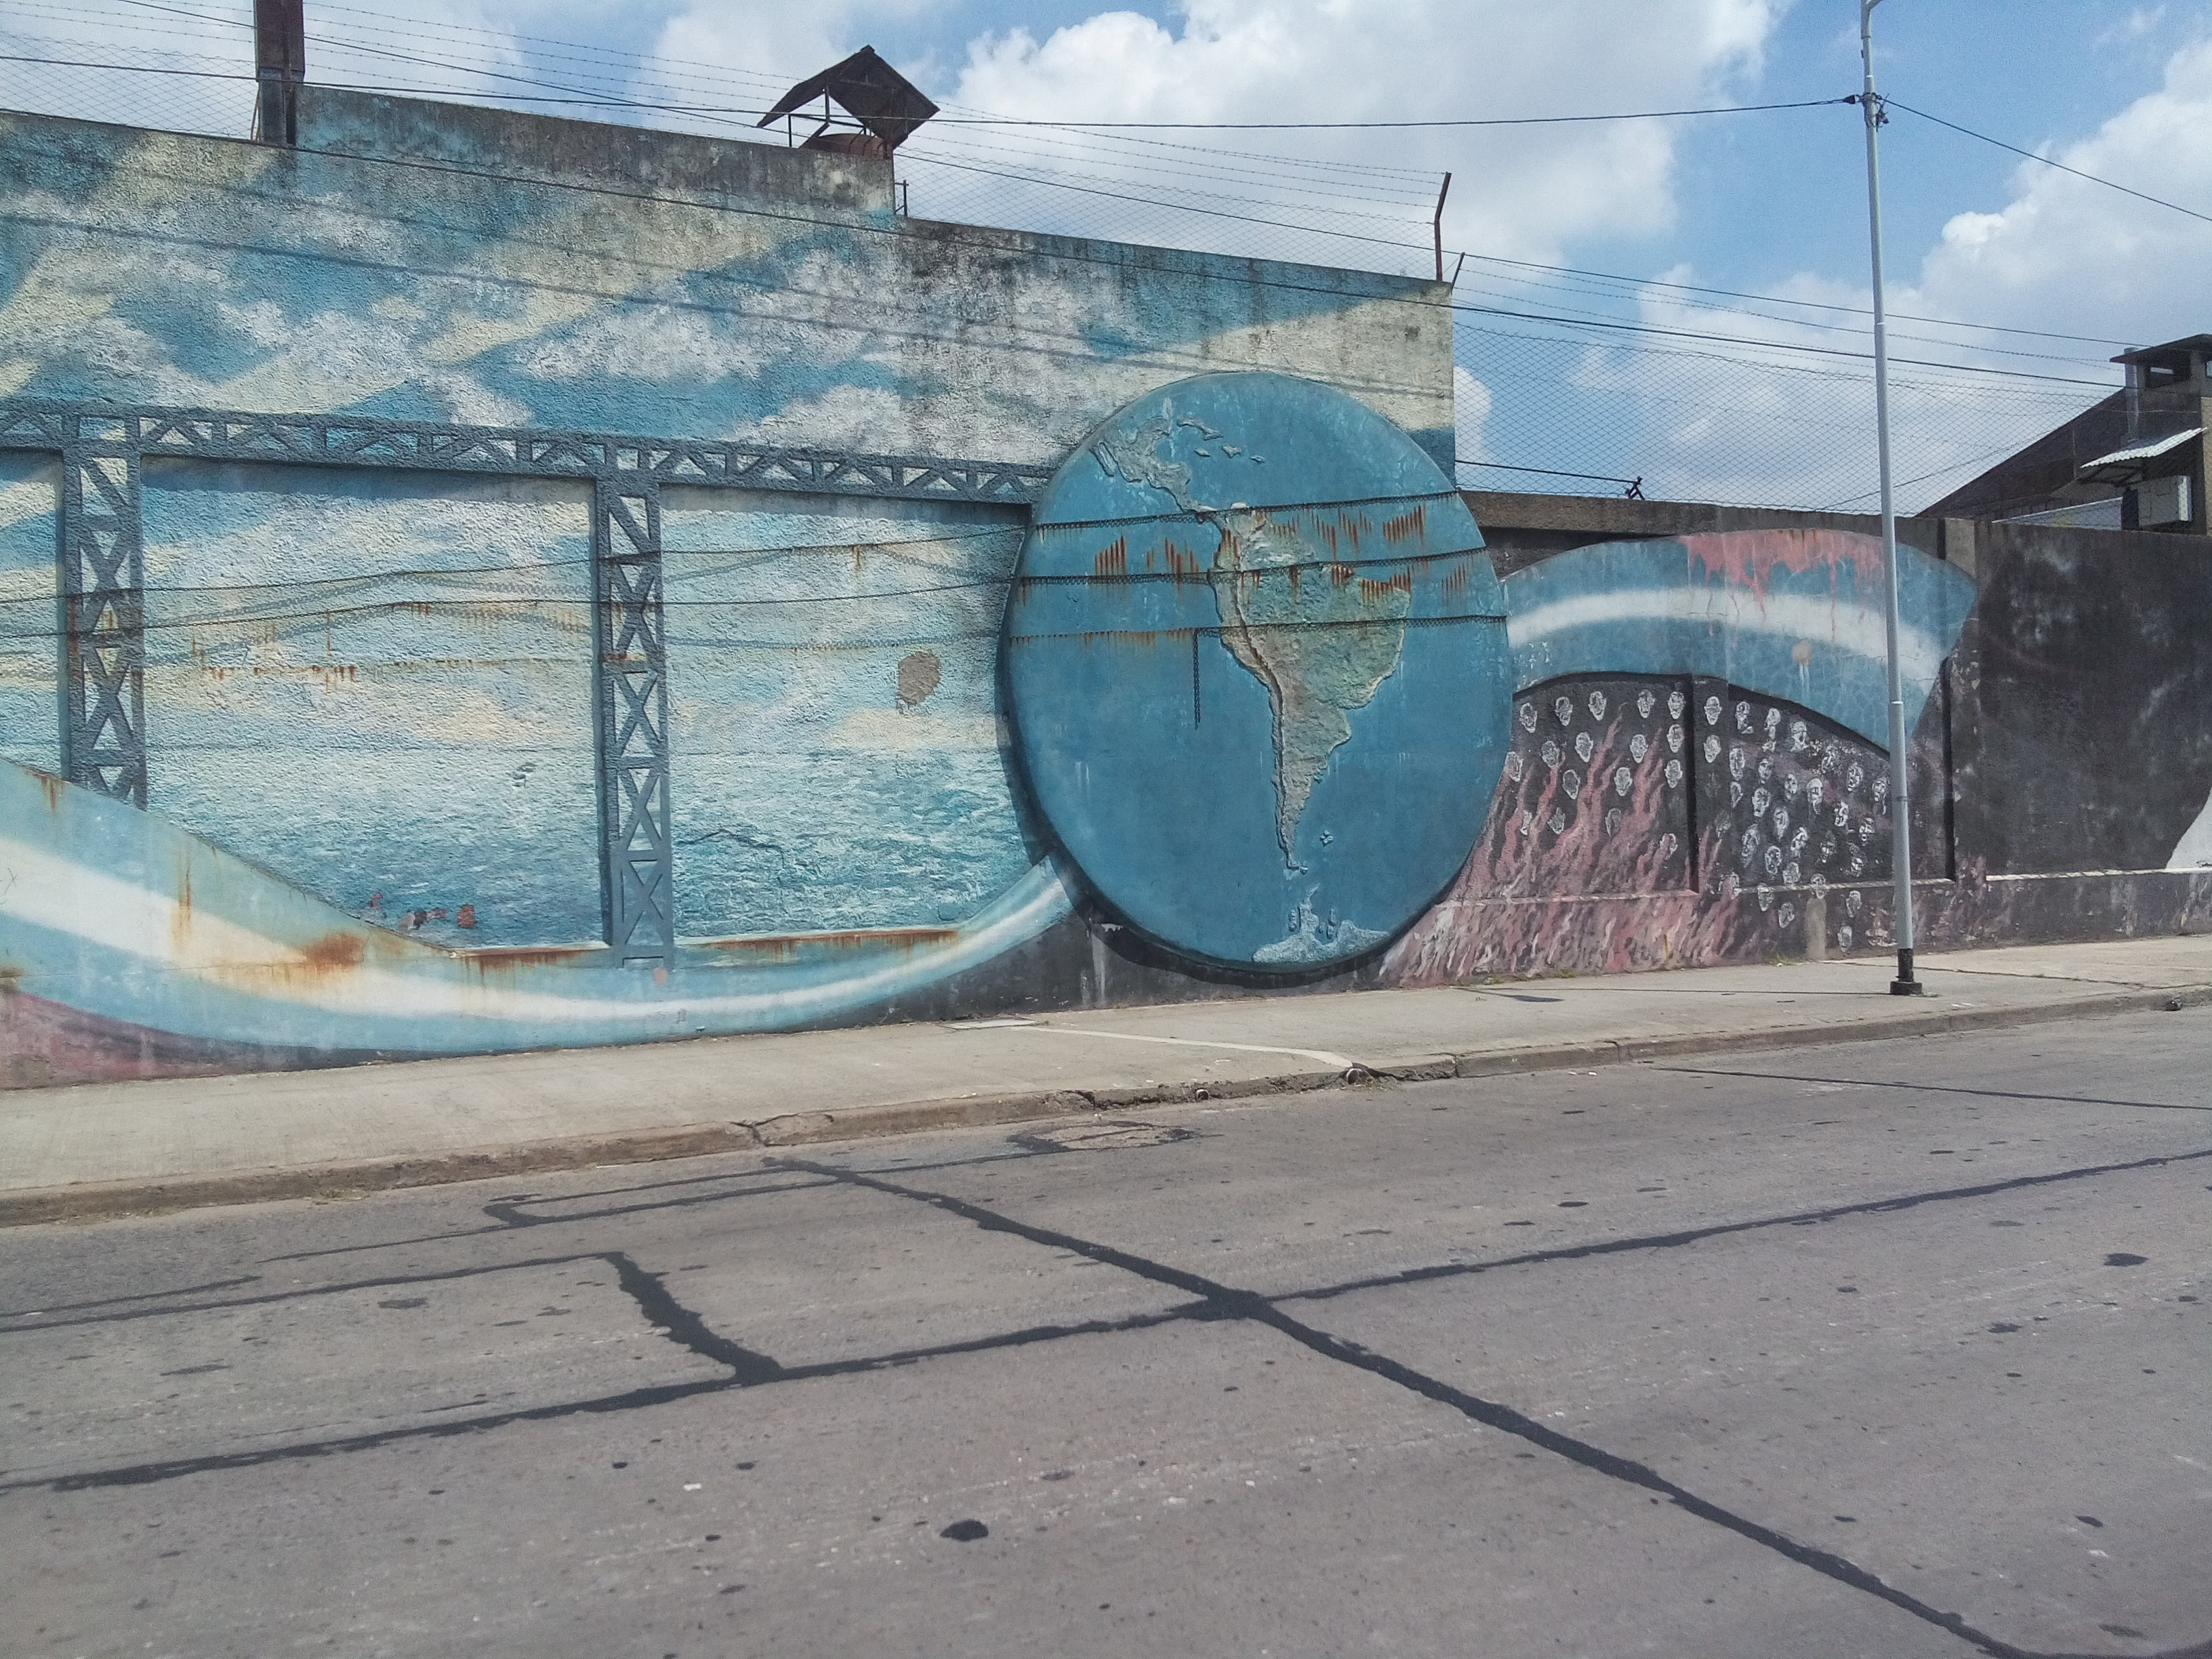 Mural fábrica Ferrum - Mural en la fábrica Ferrum